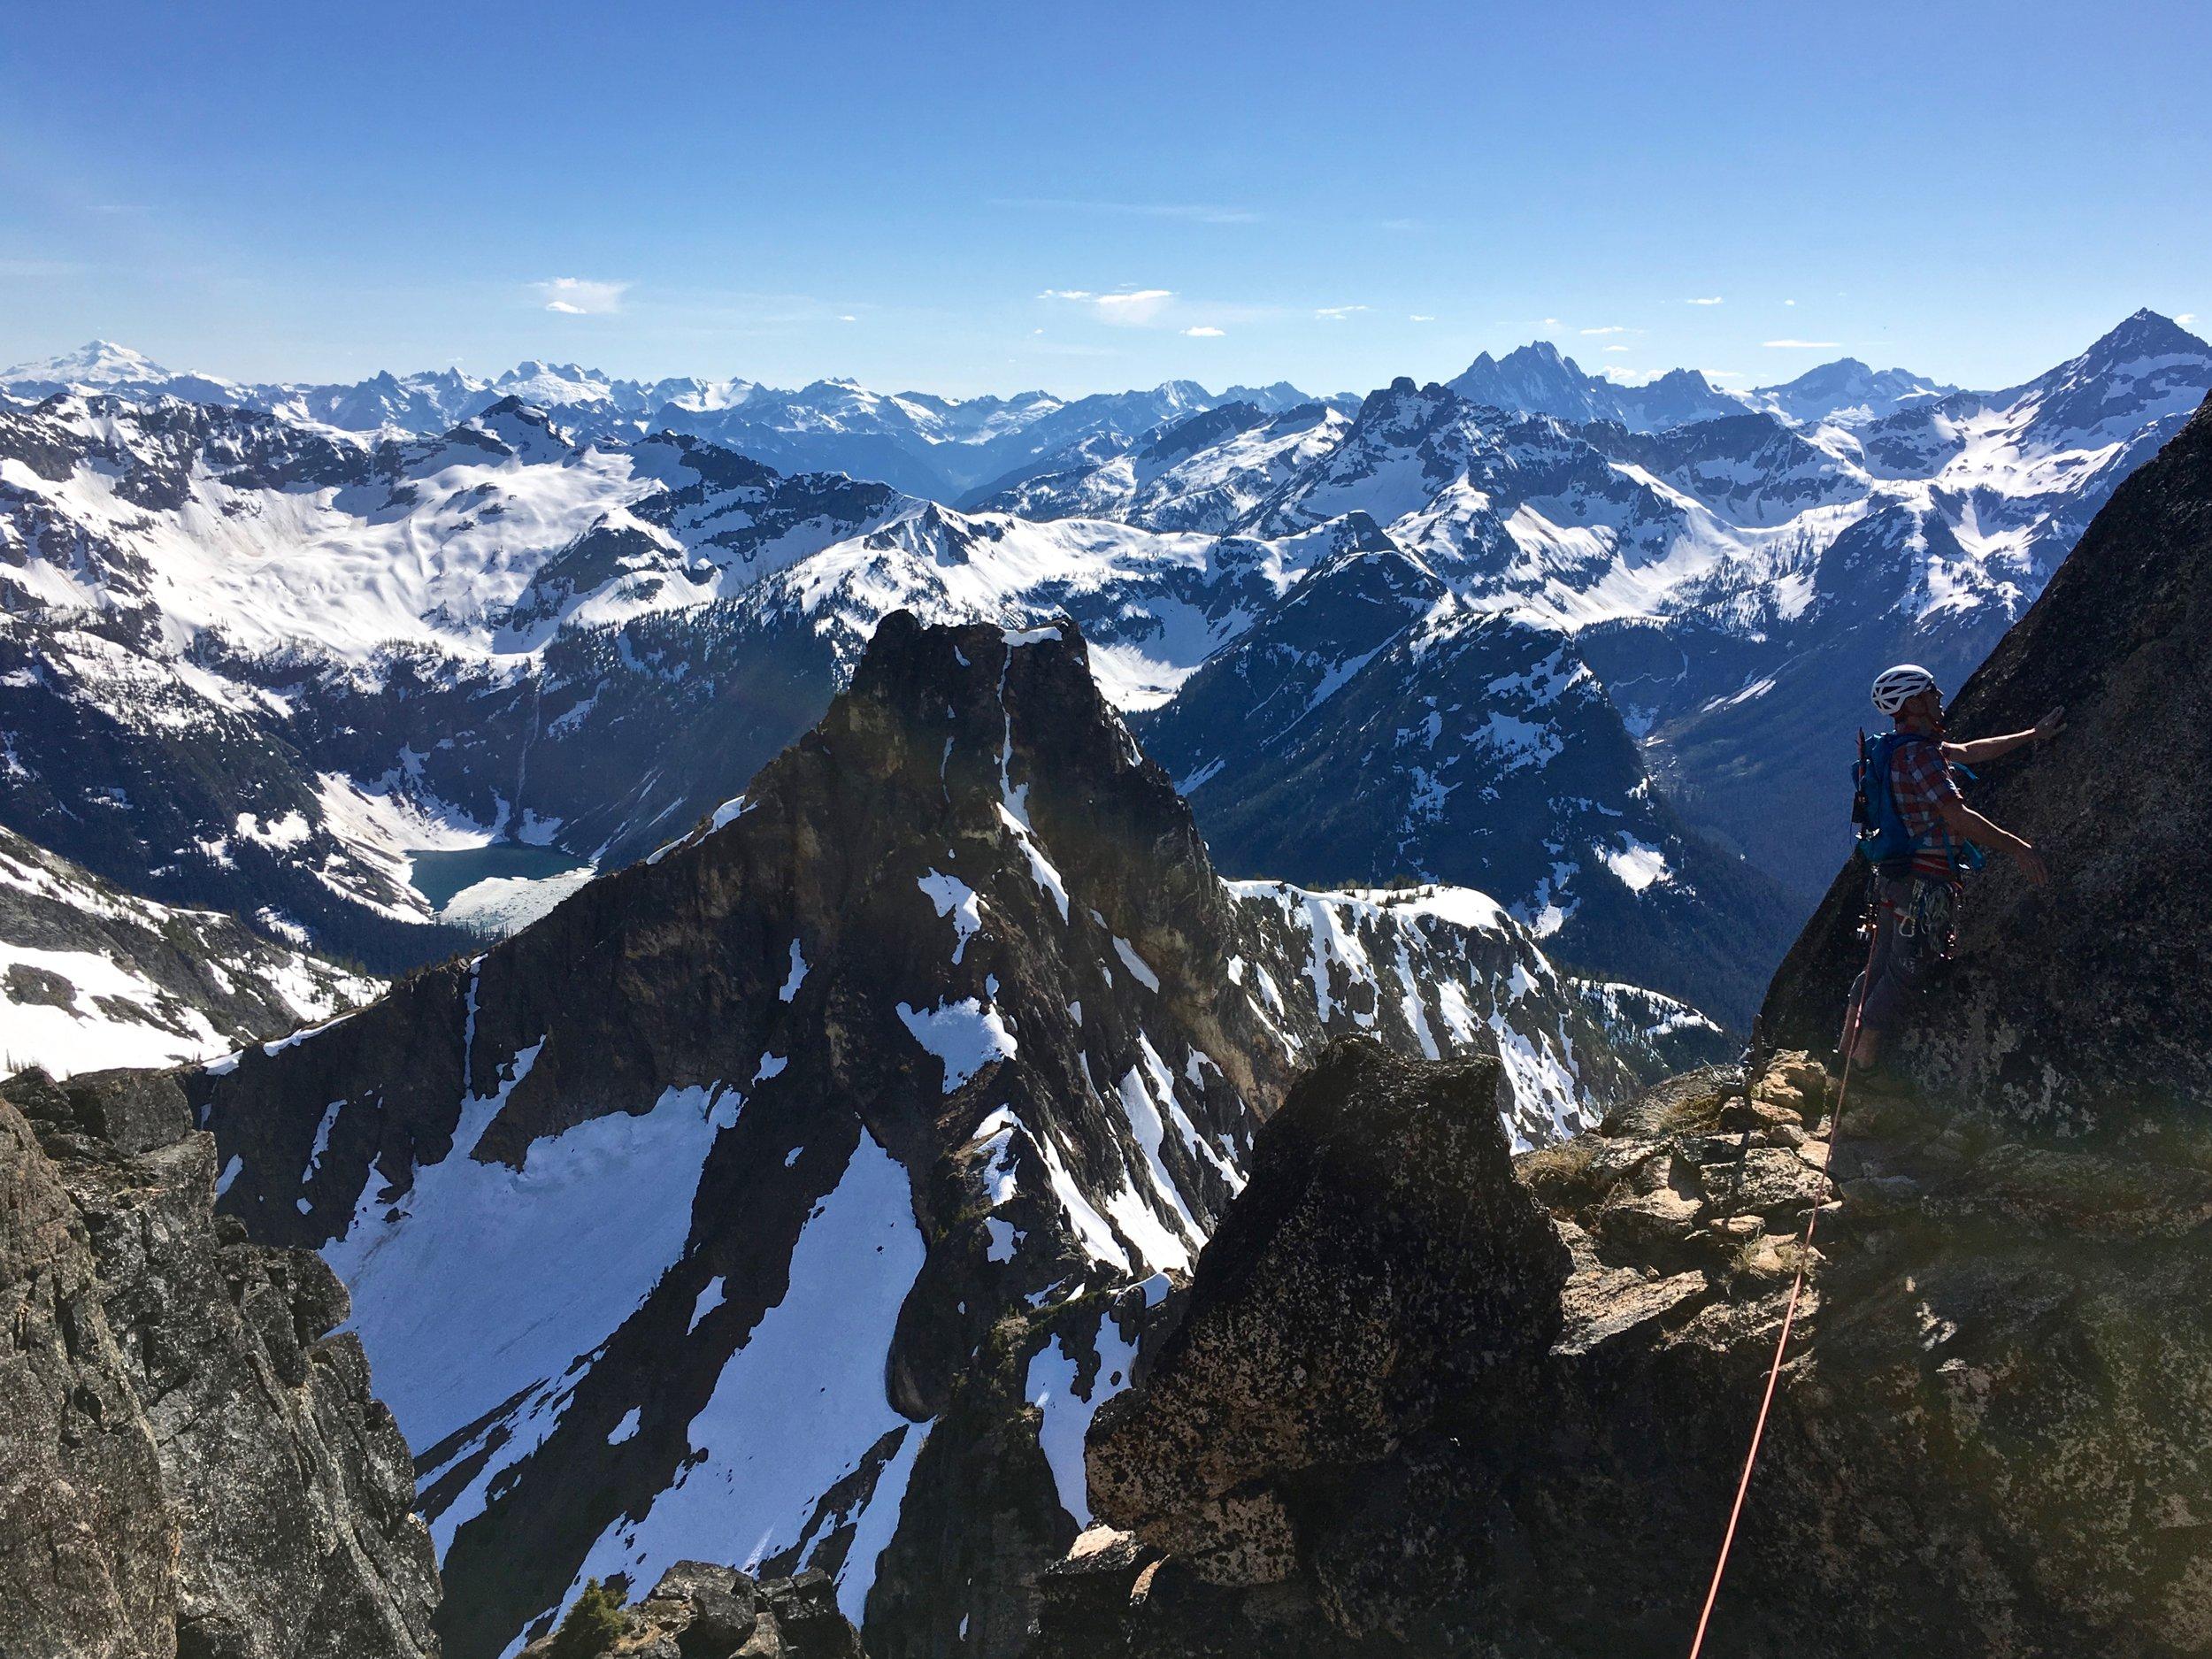 Dale near the summit of Cutthroat